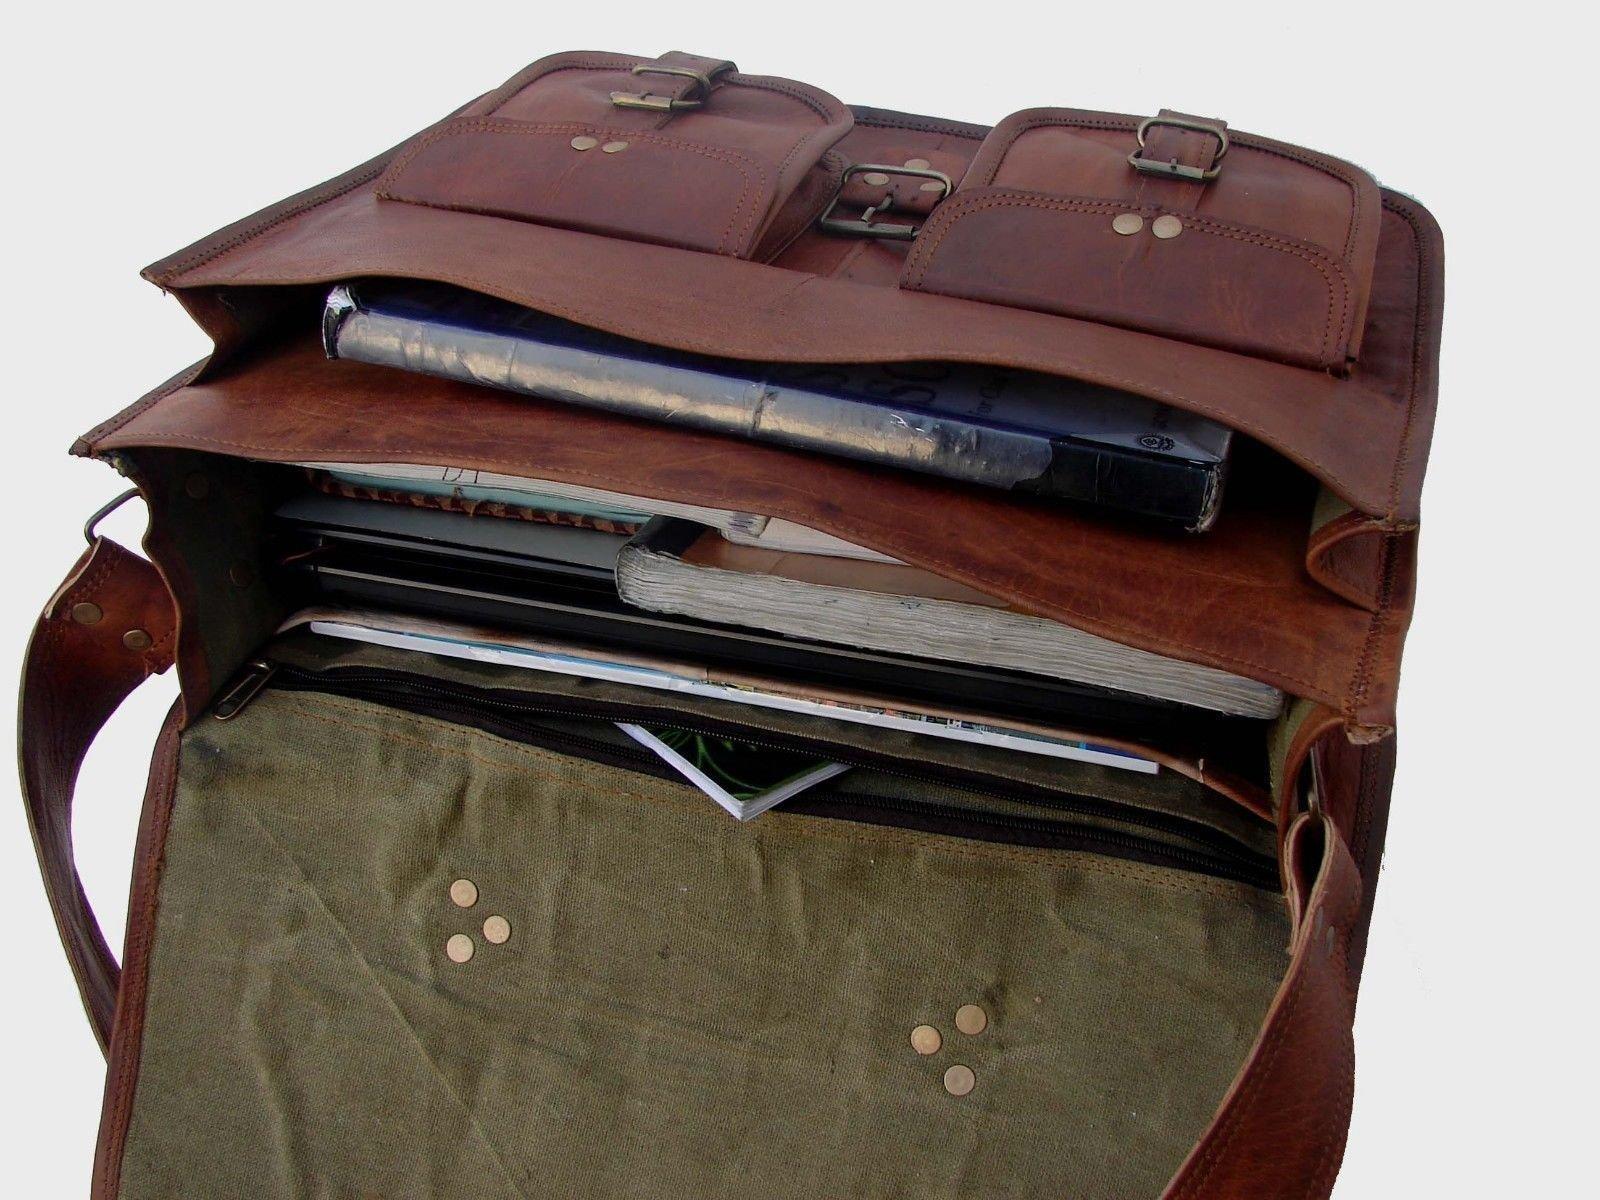 Leather Laptop Messenger Retro Bag Vintage Office Briefcase College Bag 16 Inch